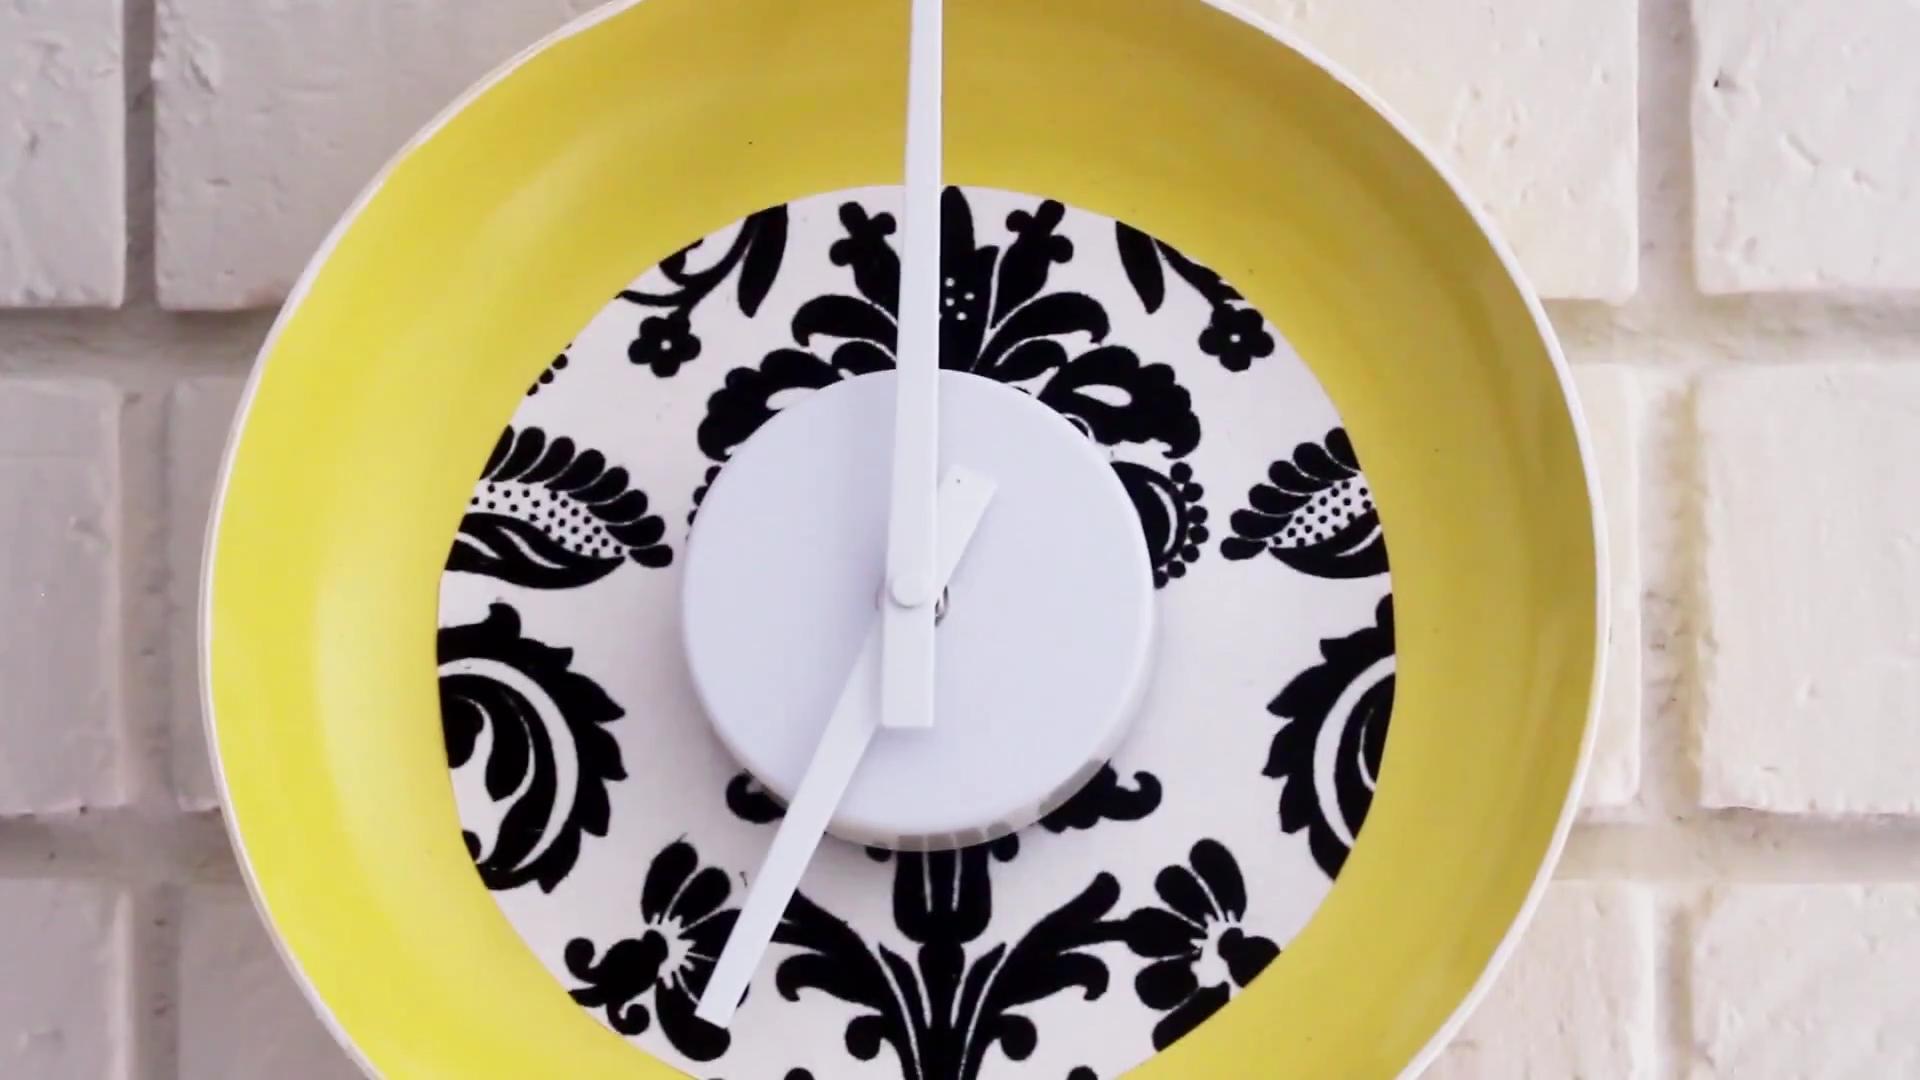 DIY Frying Pan Clock | Cute Handmade Kitchen Home Decor ... on wood kitchen crafts, rustic kitchen crafts, country kitchen crafts, sewing kitchen crafts, primitive kitchen crafts, homemade kitchen crafts,